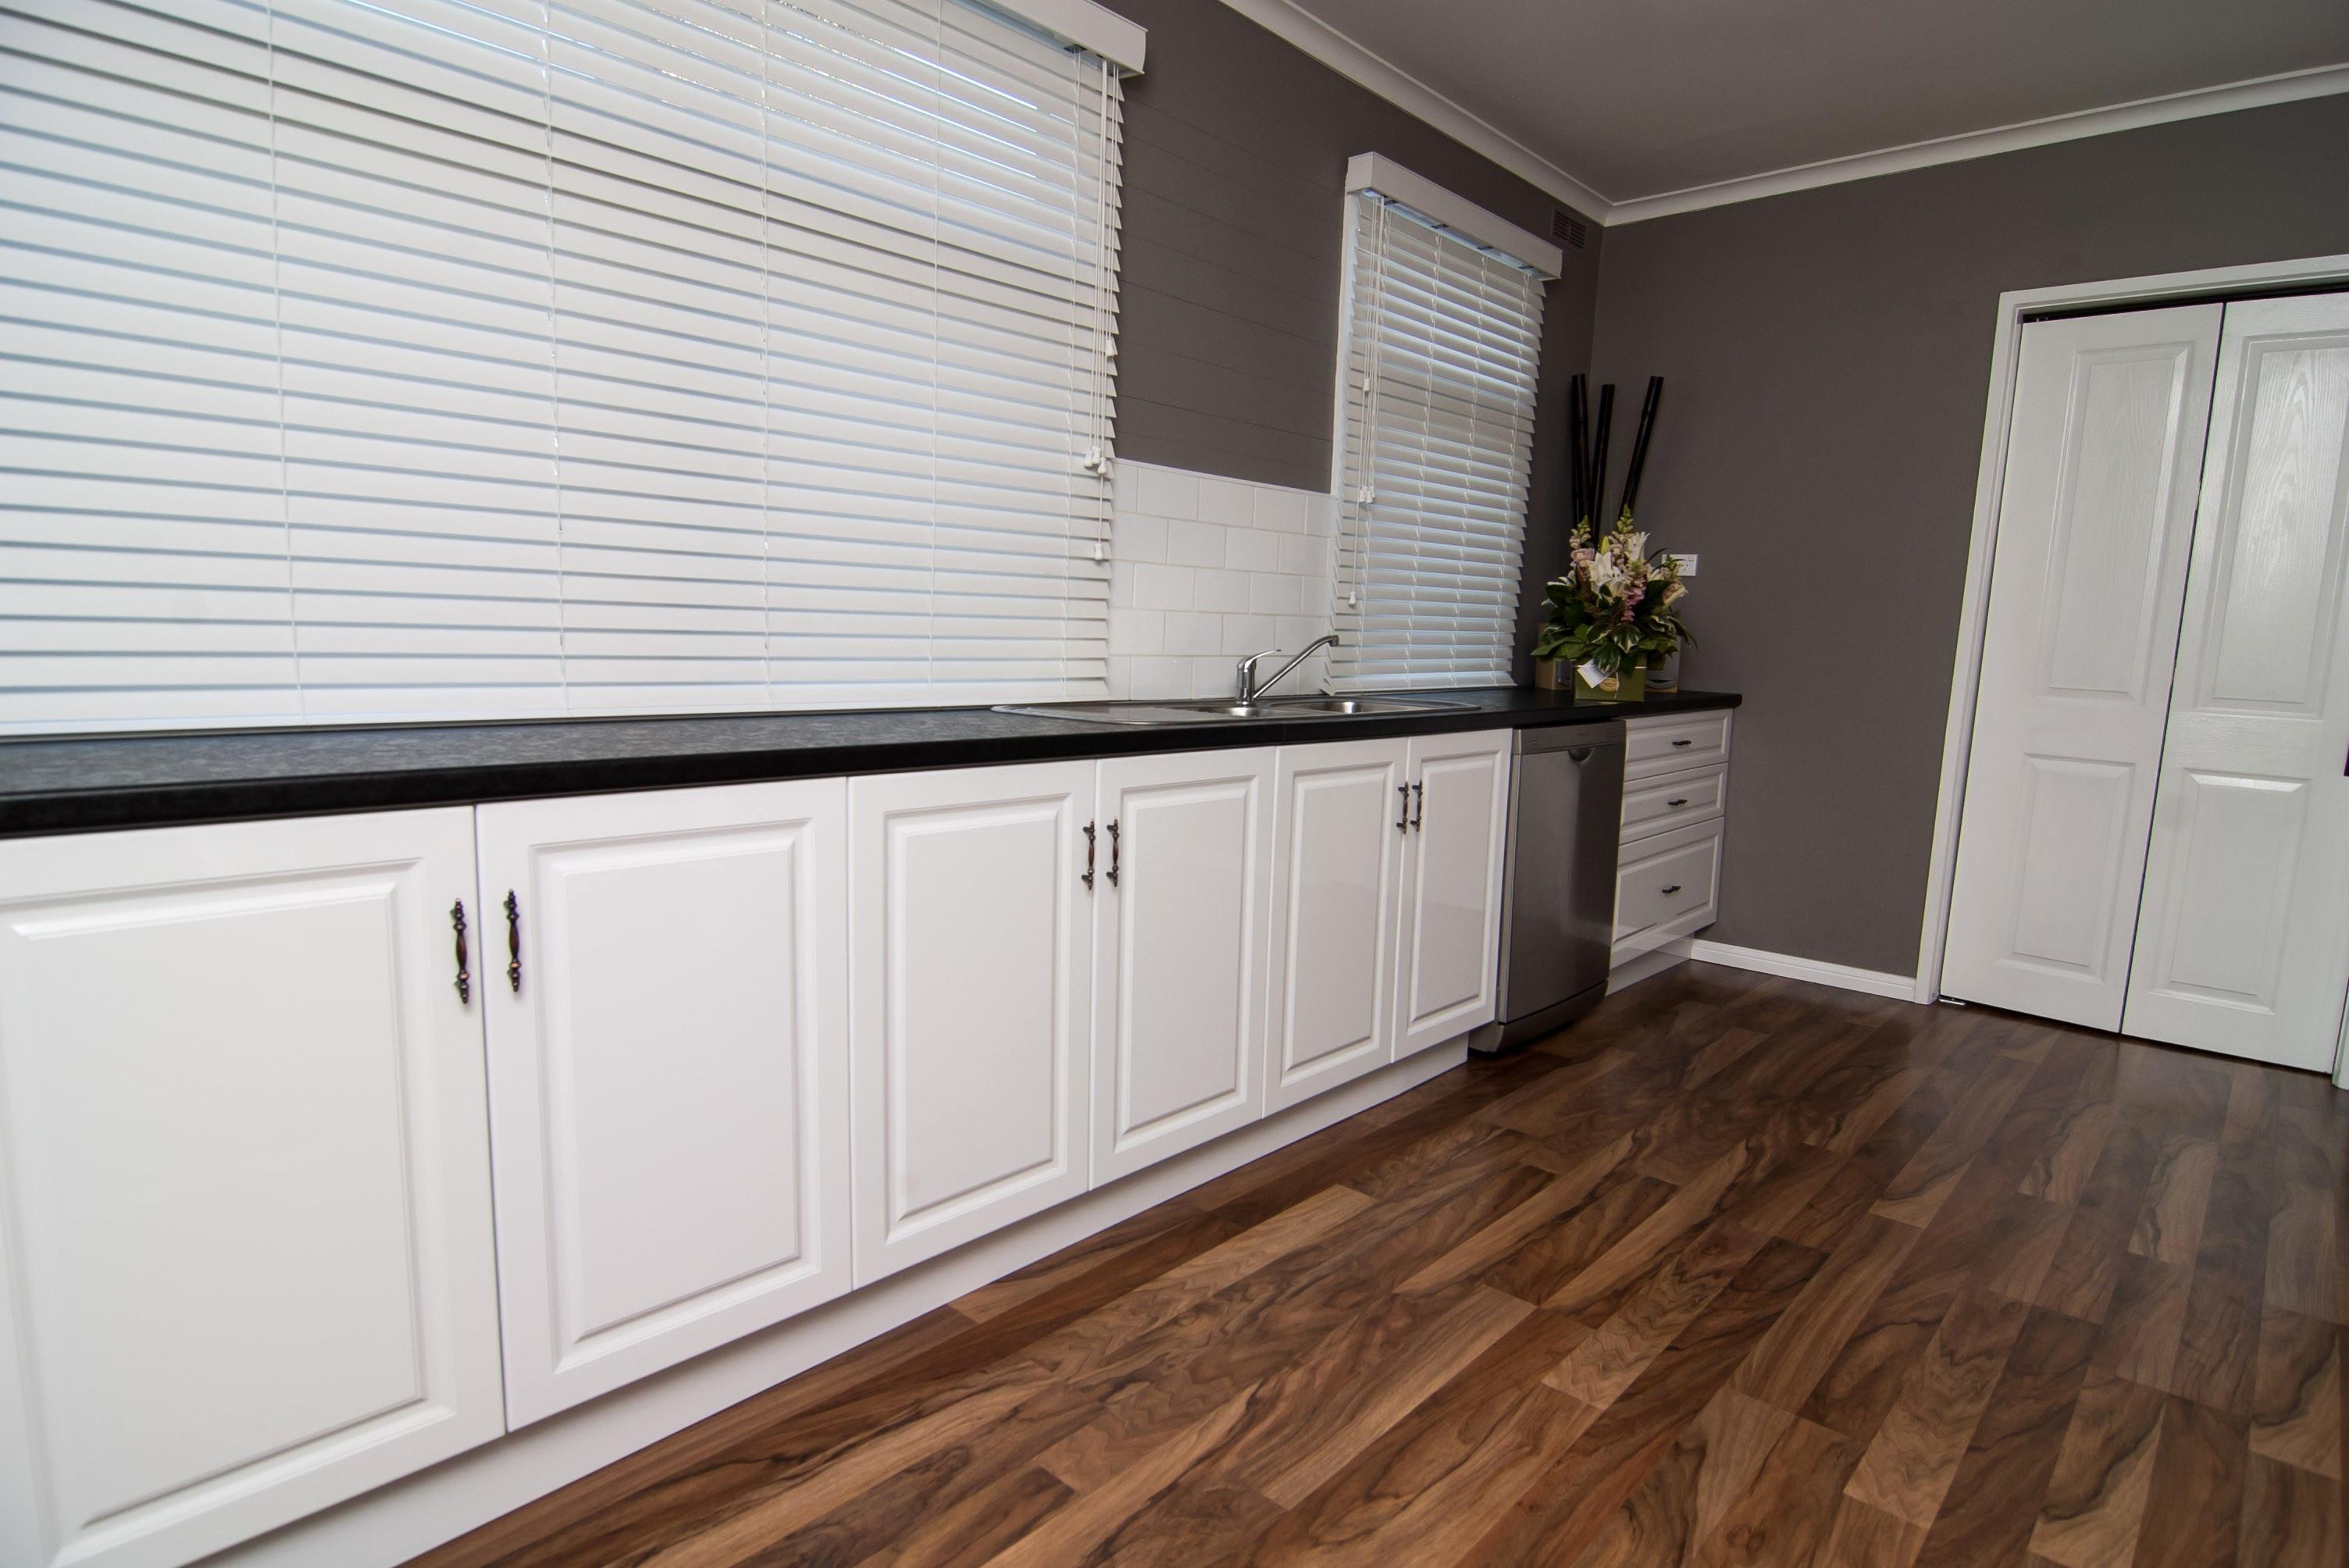 lowes hardwood flooring of kitchen with wood floors new interior amazing bruce wood flooring with kitchen with wood floors fresh 10 fresh kitchen cabinet faces